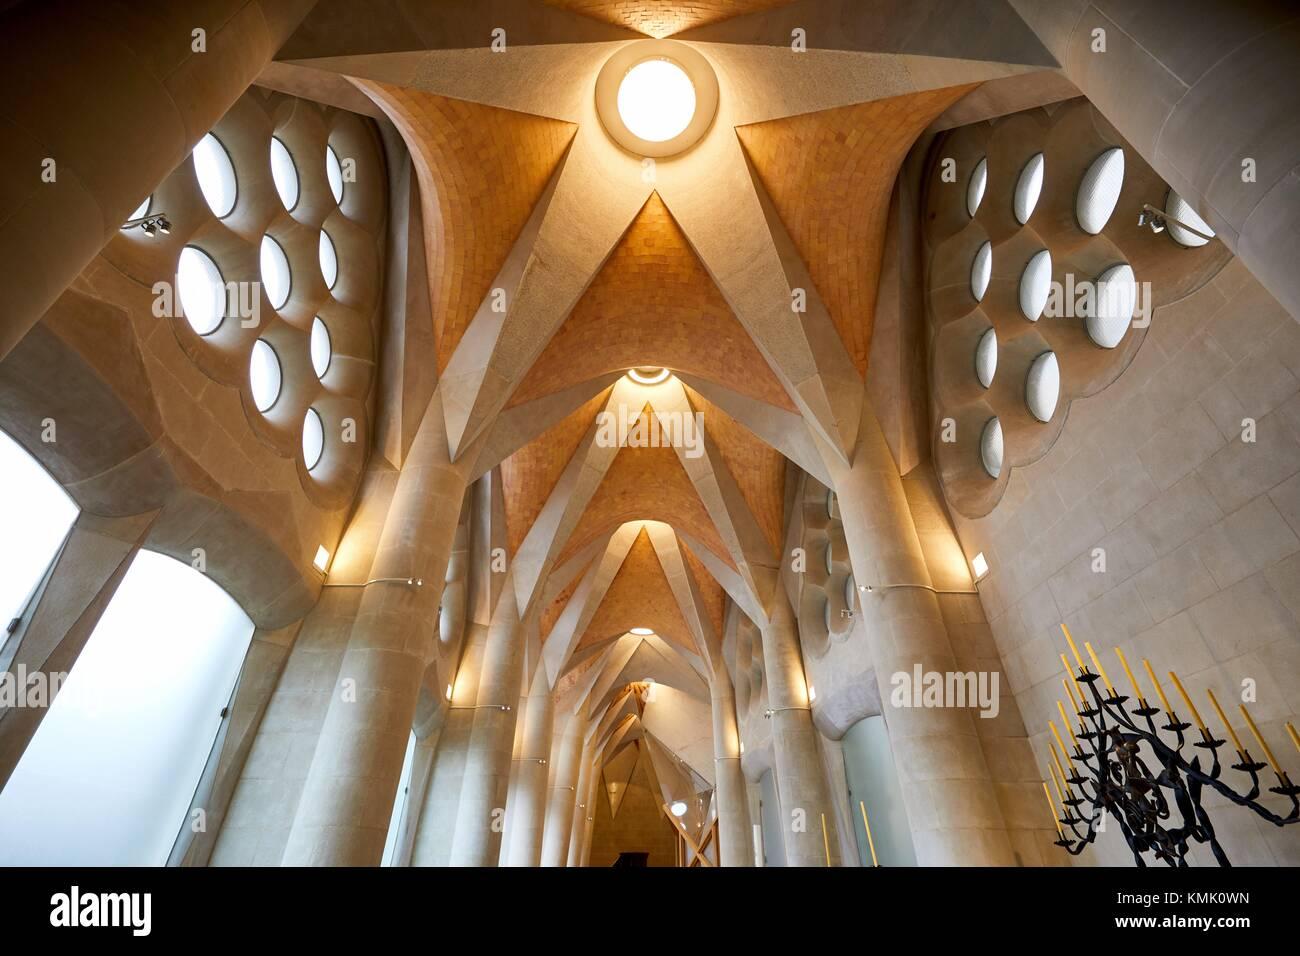 Sacristy, La Sagrada Familia Church, by the architect Antoni Gaudi, Eixample district, Barcelona, Catalonia, Spain - Stock Image